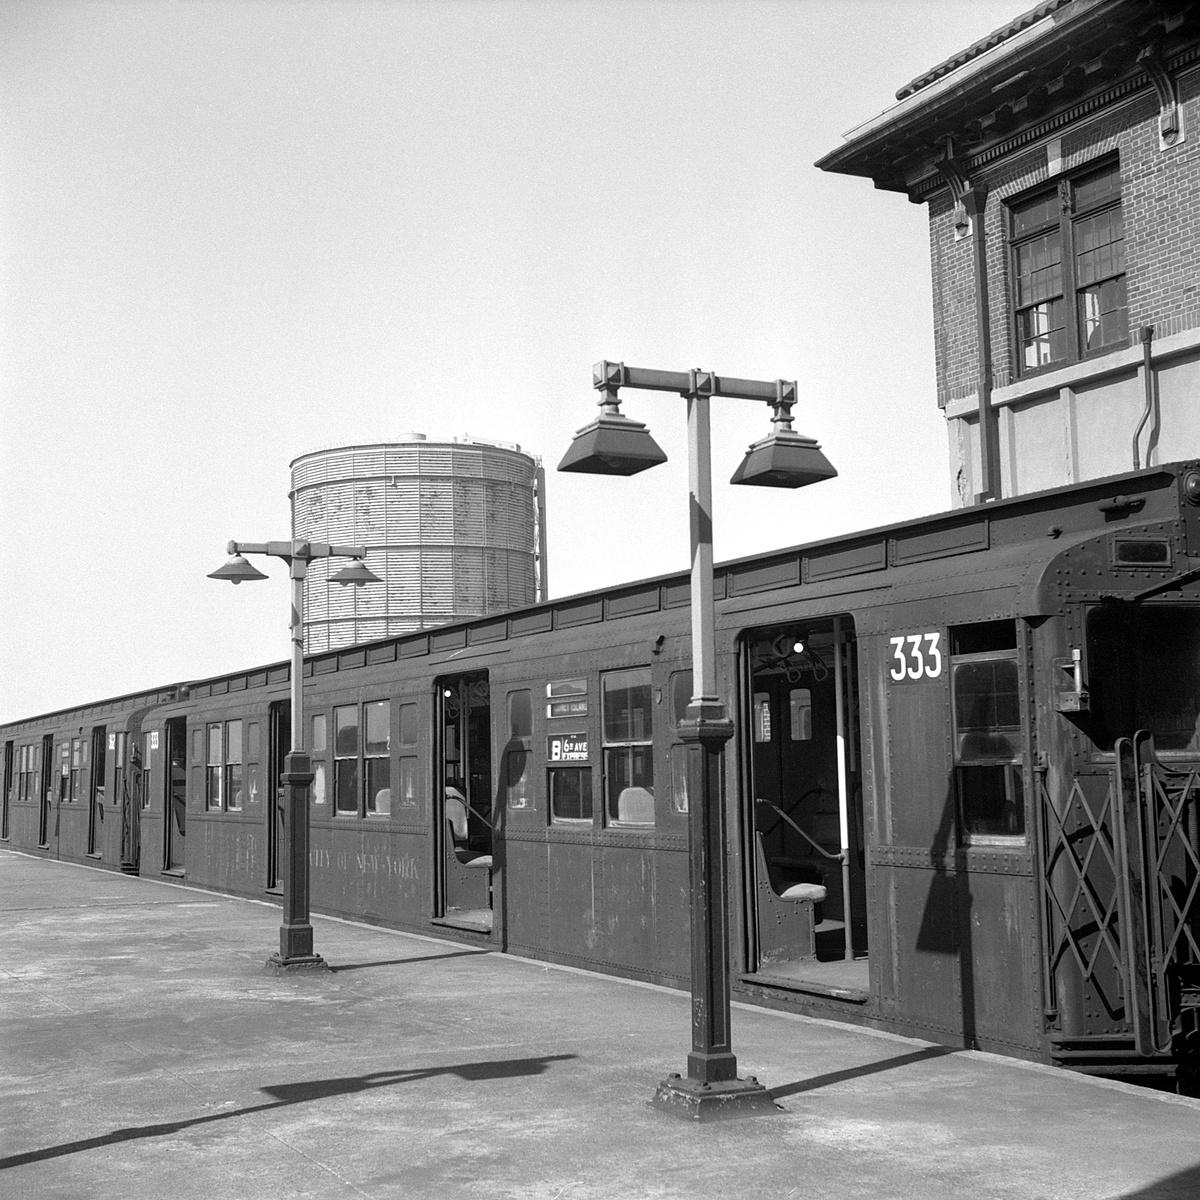 (572k, 1200x1200)<br><b>Country:</b> United States<br><b>City:</b> New York<br><b>System:</b> New York City Transit<br><b>Location:</b> Coney Island/Stillwell Avenue<br><b>Route:</b> B<br><b>Car:</b> R-1 (American Car & Foundry, 1930-1931) 333 <br><b>Collection of:</b> David Pirmann<br><b>Date:</b> 4/6/1968<br><b>Viewed (this week/total):</b> 11 / 98